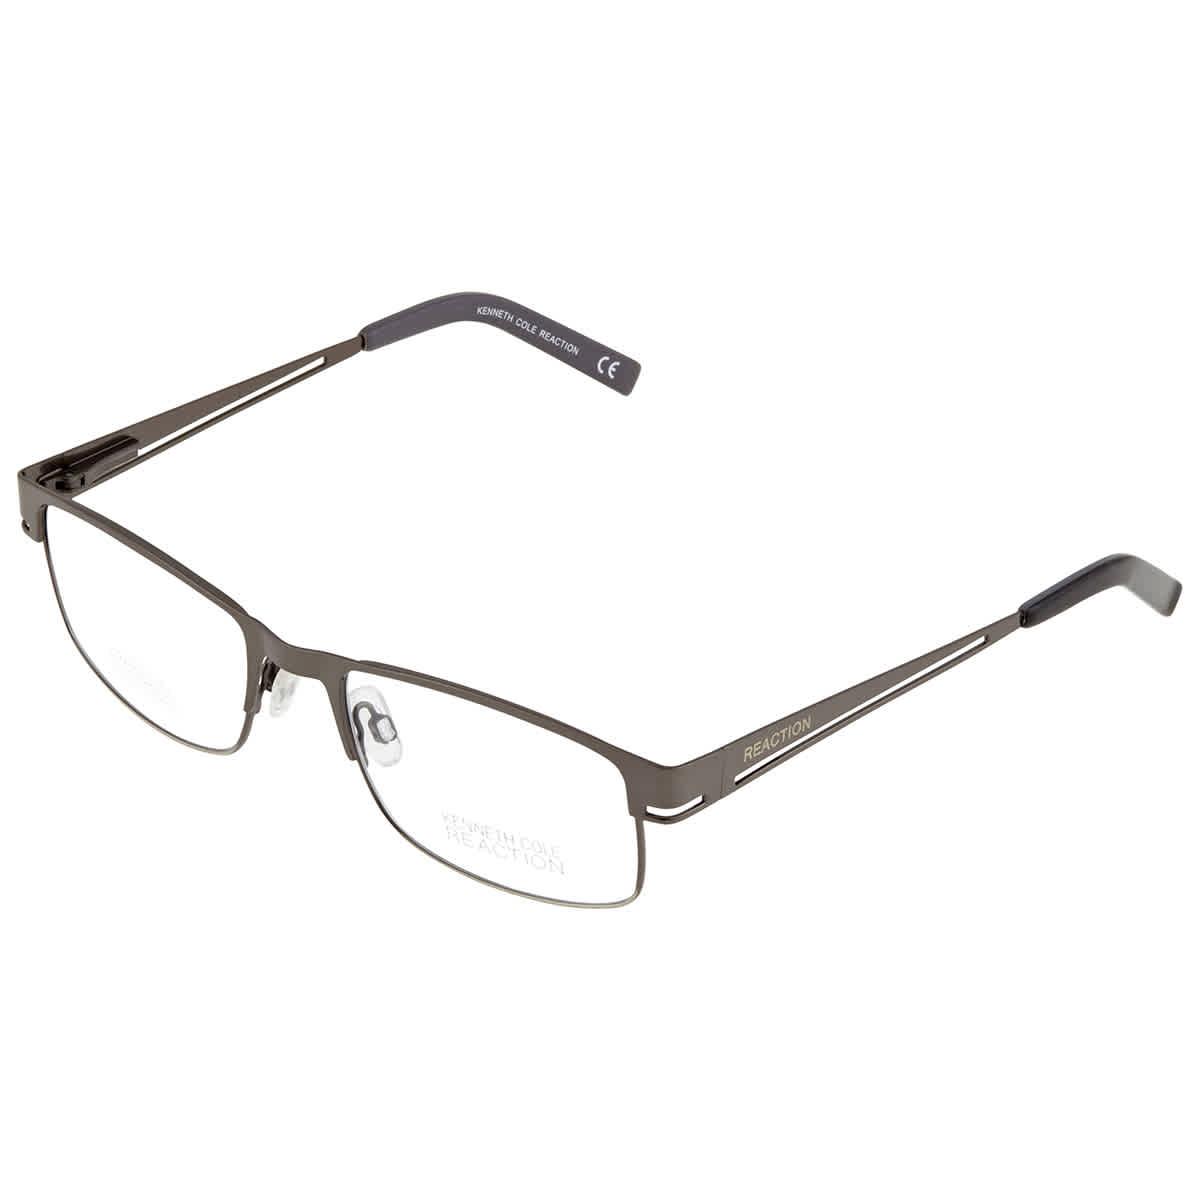 Kenneth Cole Reaction Mens Gunmetal Square Eyeglass Frames Kc0697 9 52 In Brown